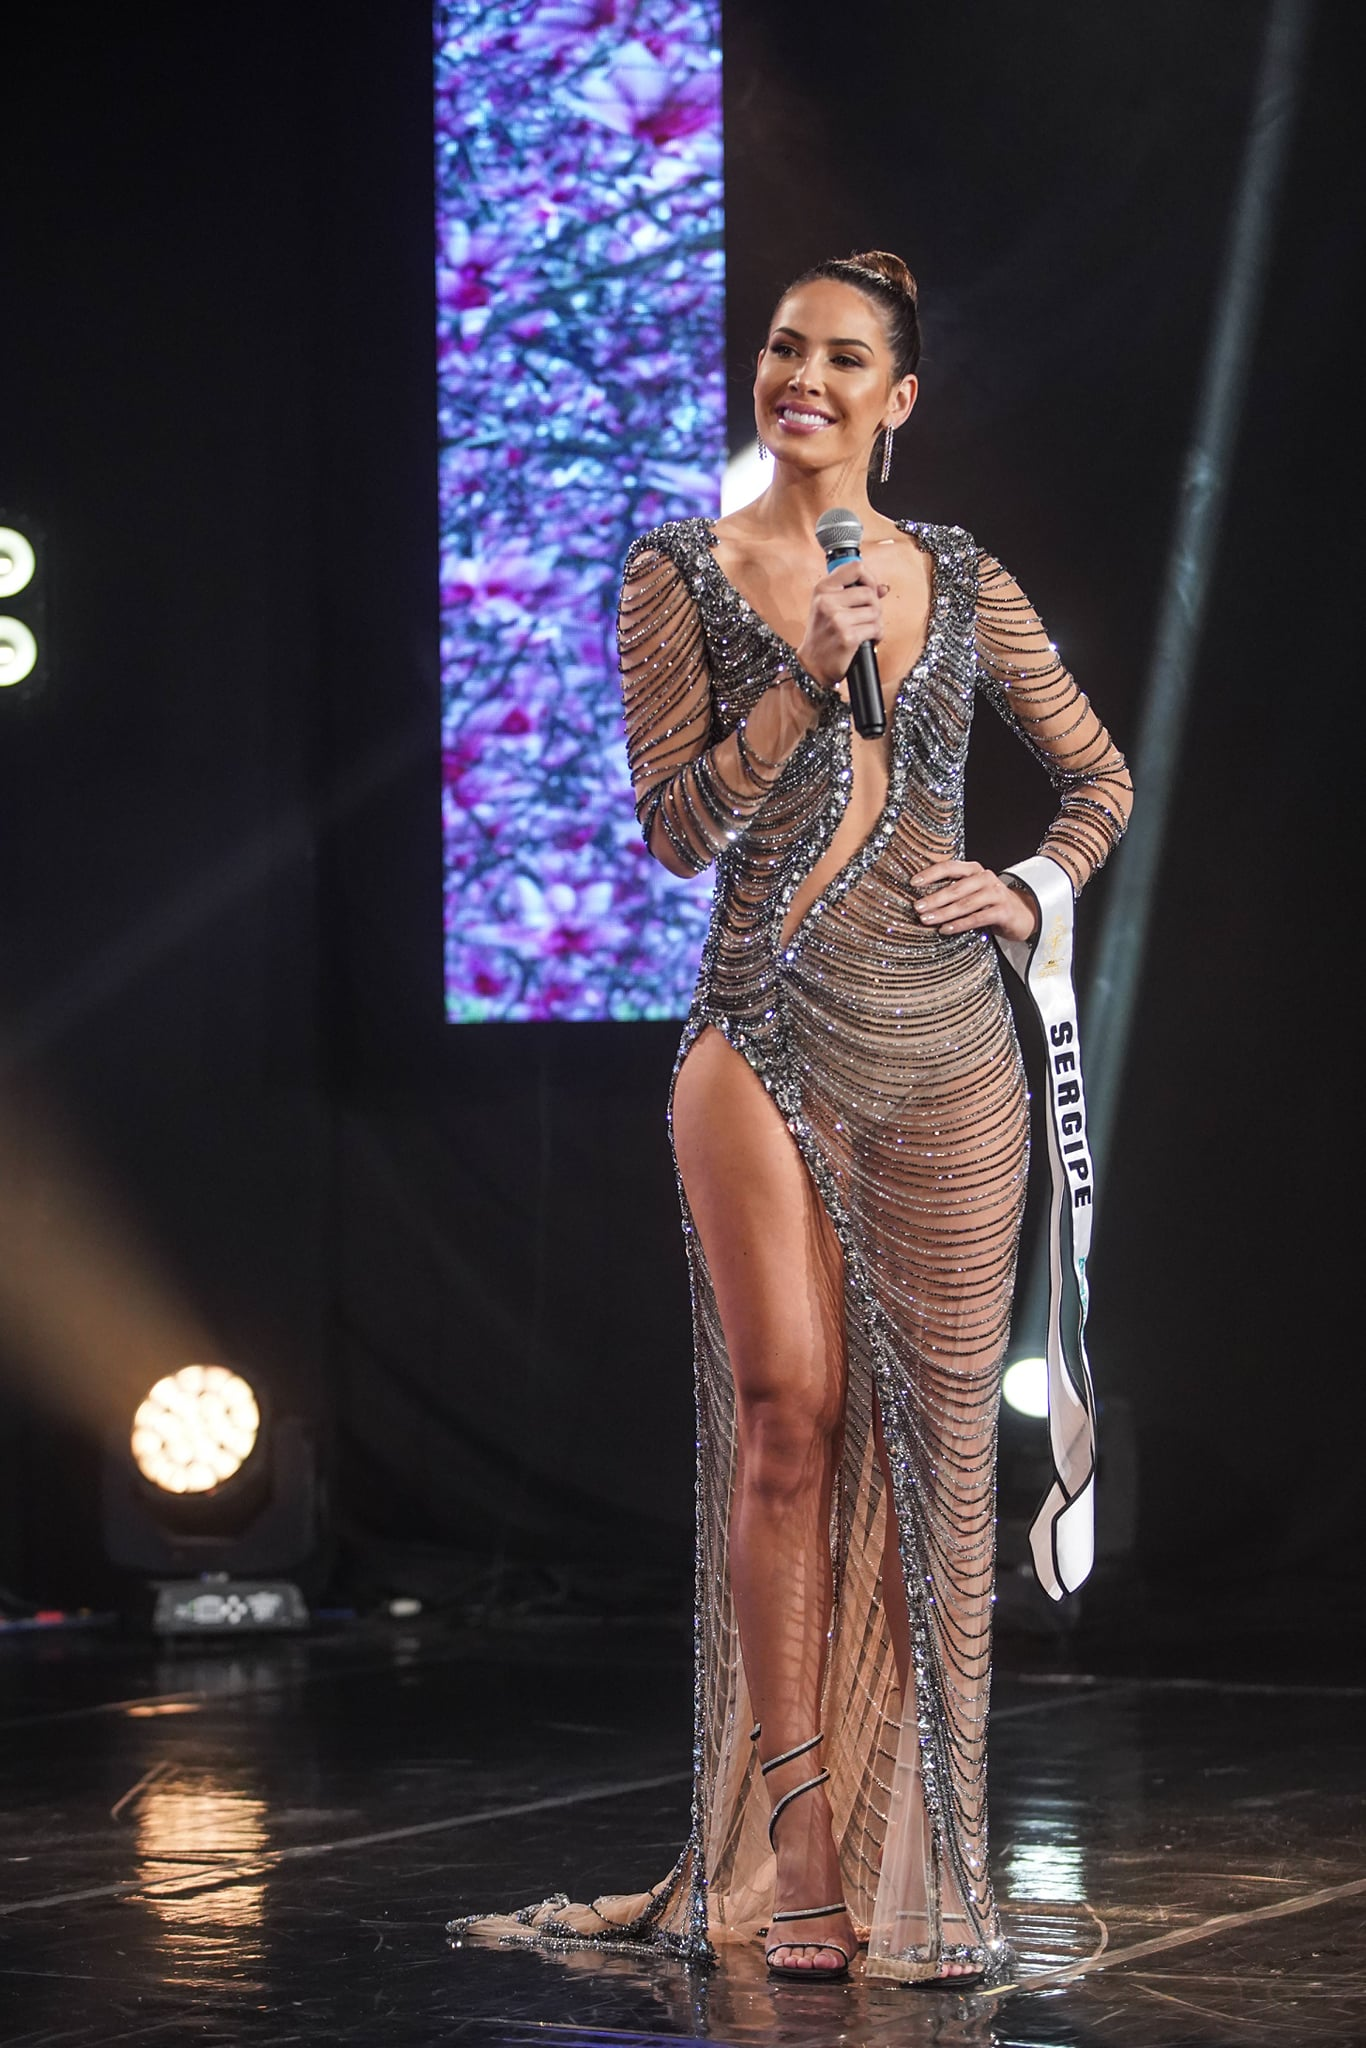 bruna zanardo, 1st runner-up de miss supranational brazil 2020/miss brasil internacional 2017/miss brasil terra 2016. - Página 19 12945810